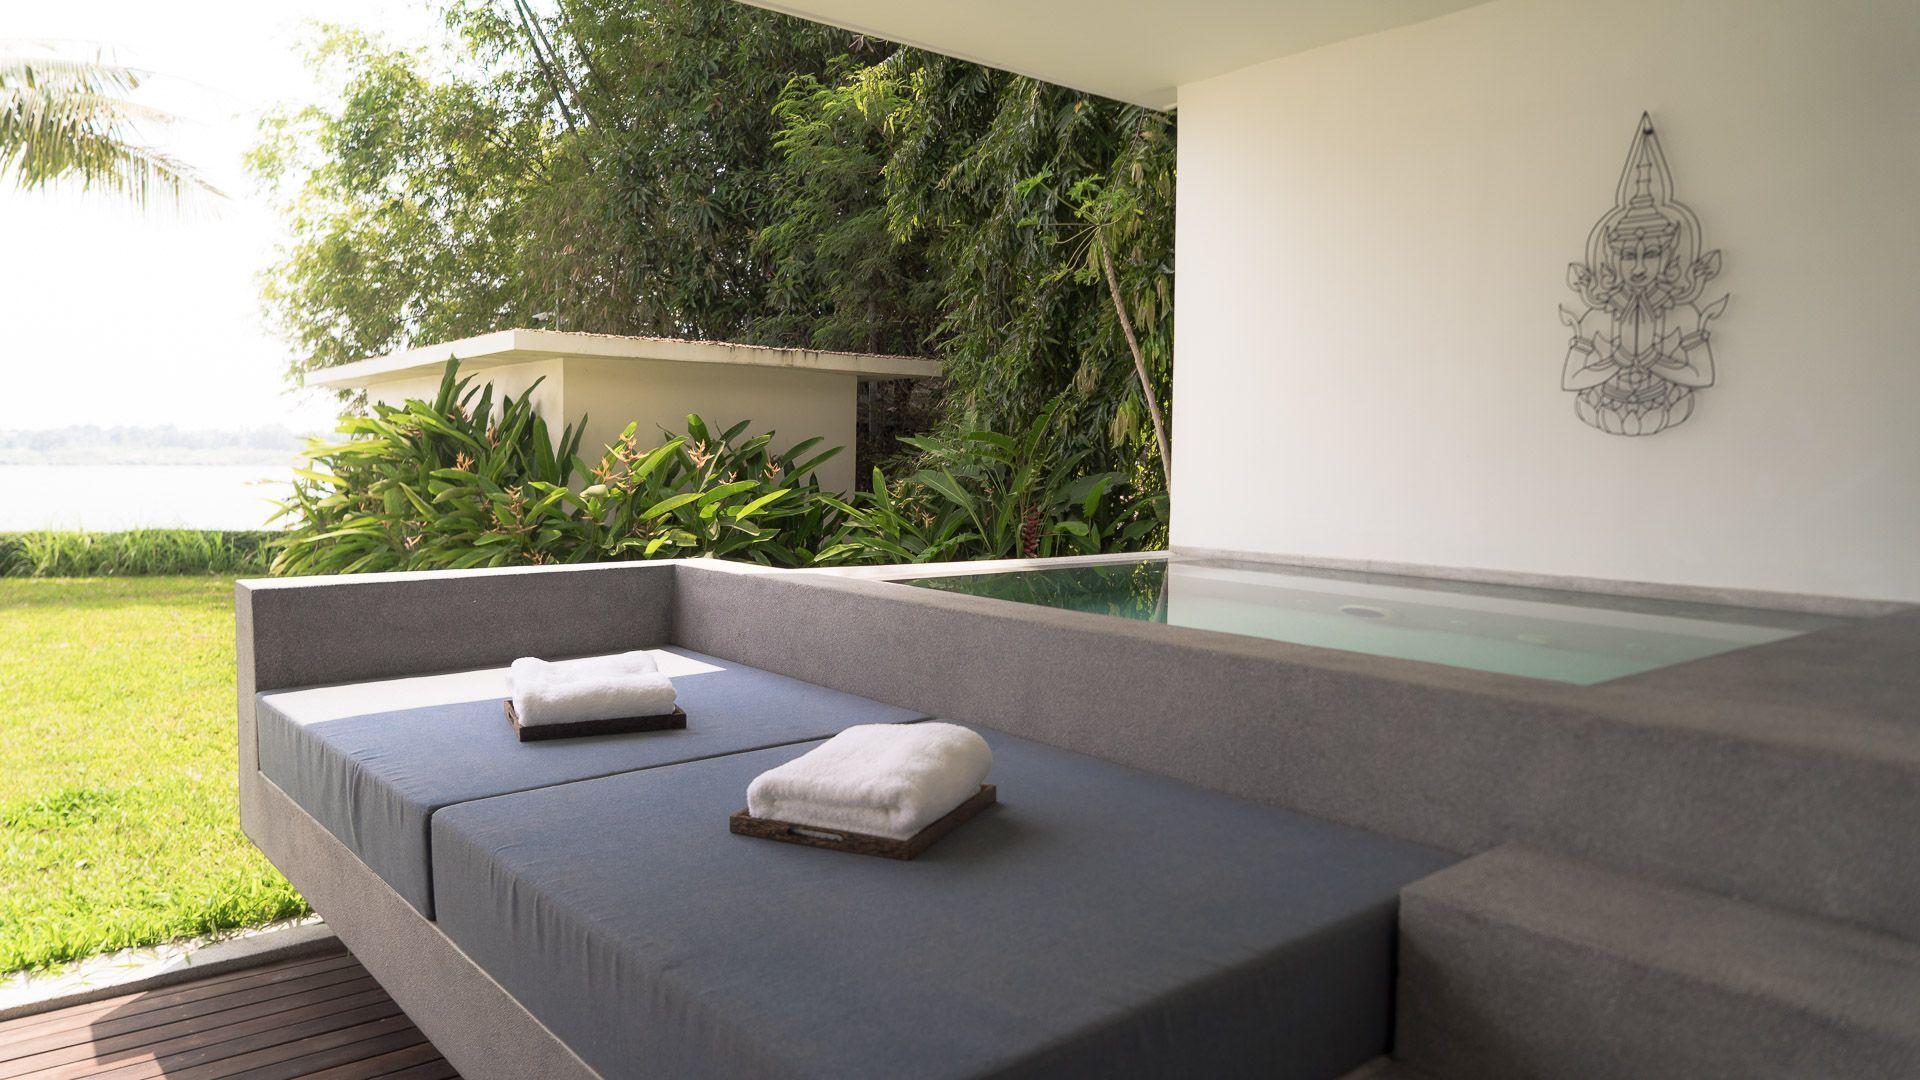 Lesvoyageuses-voyage-Phnom-Penh-cambodge-hotel-the-bale-experience-30